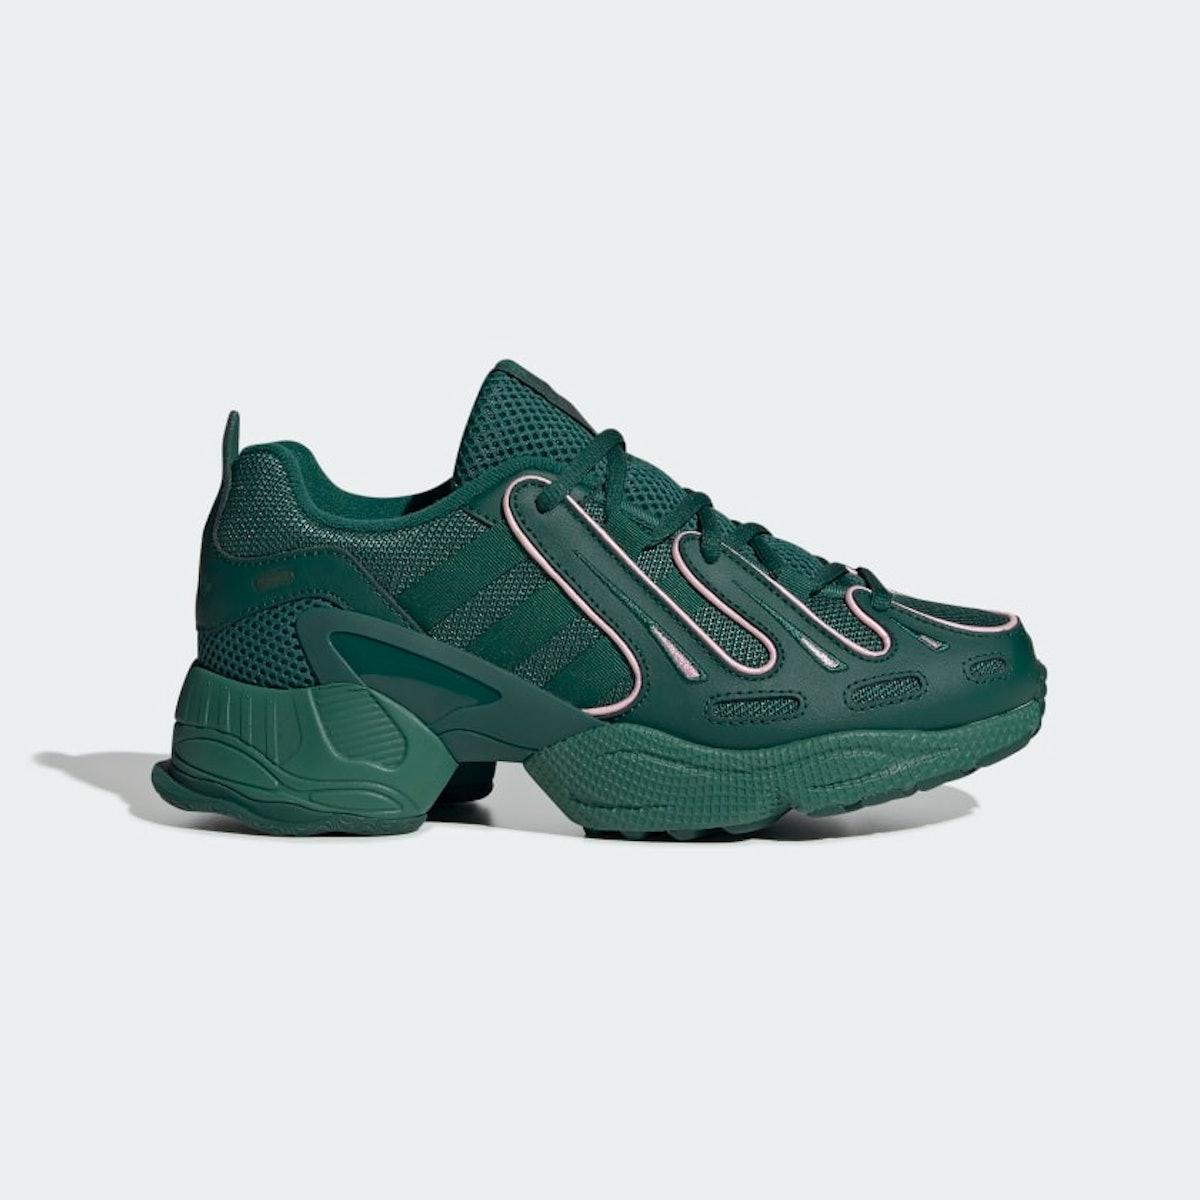 "EQT Gazelle Shoes in ""Collegiate Green"""